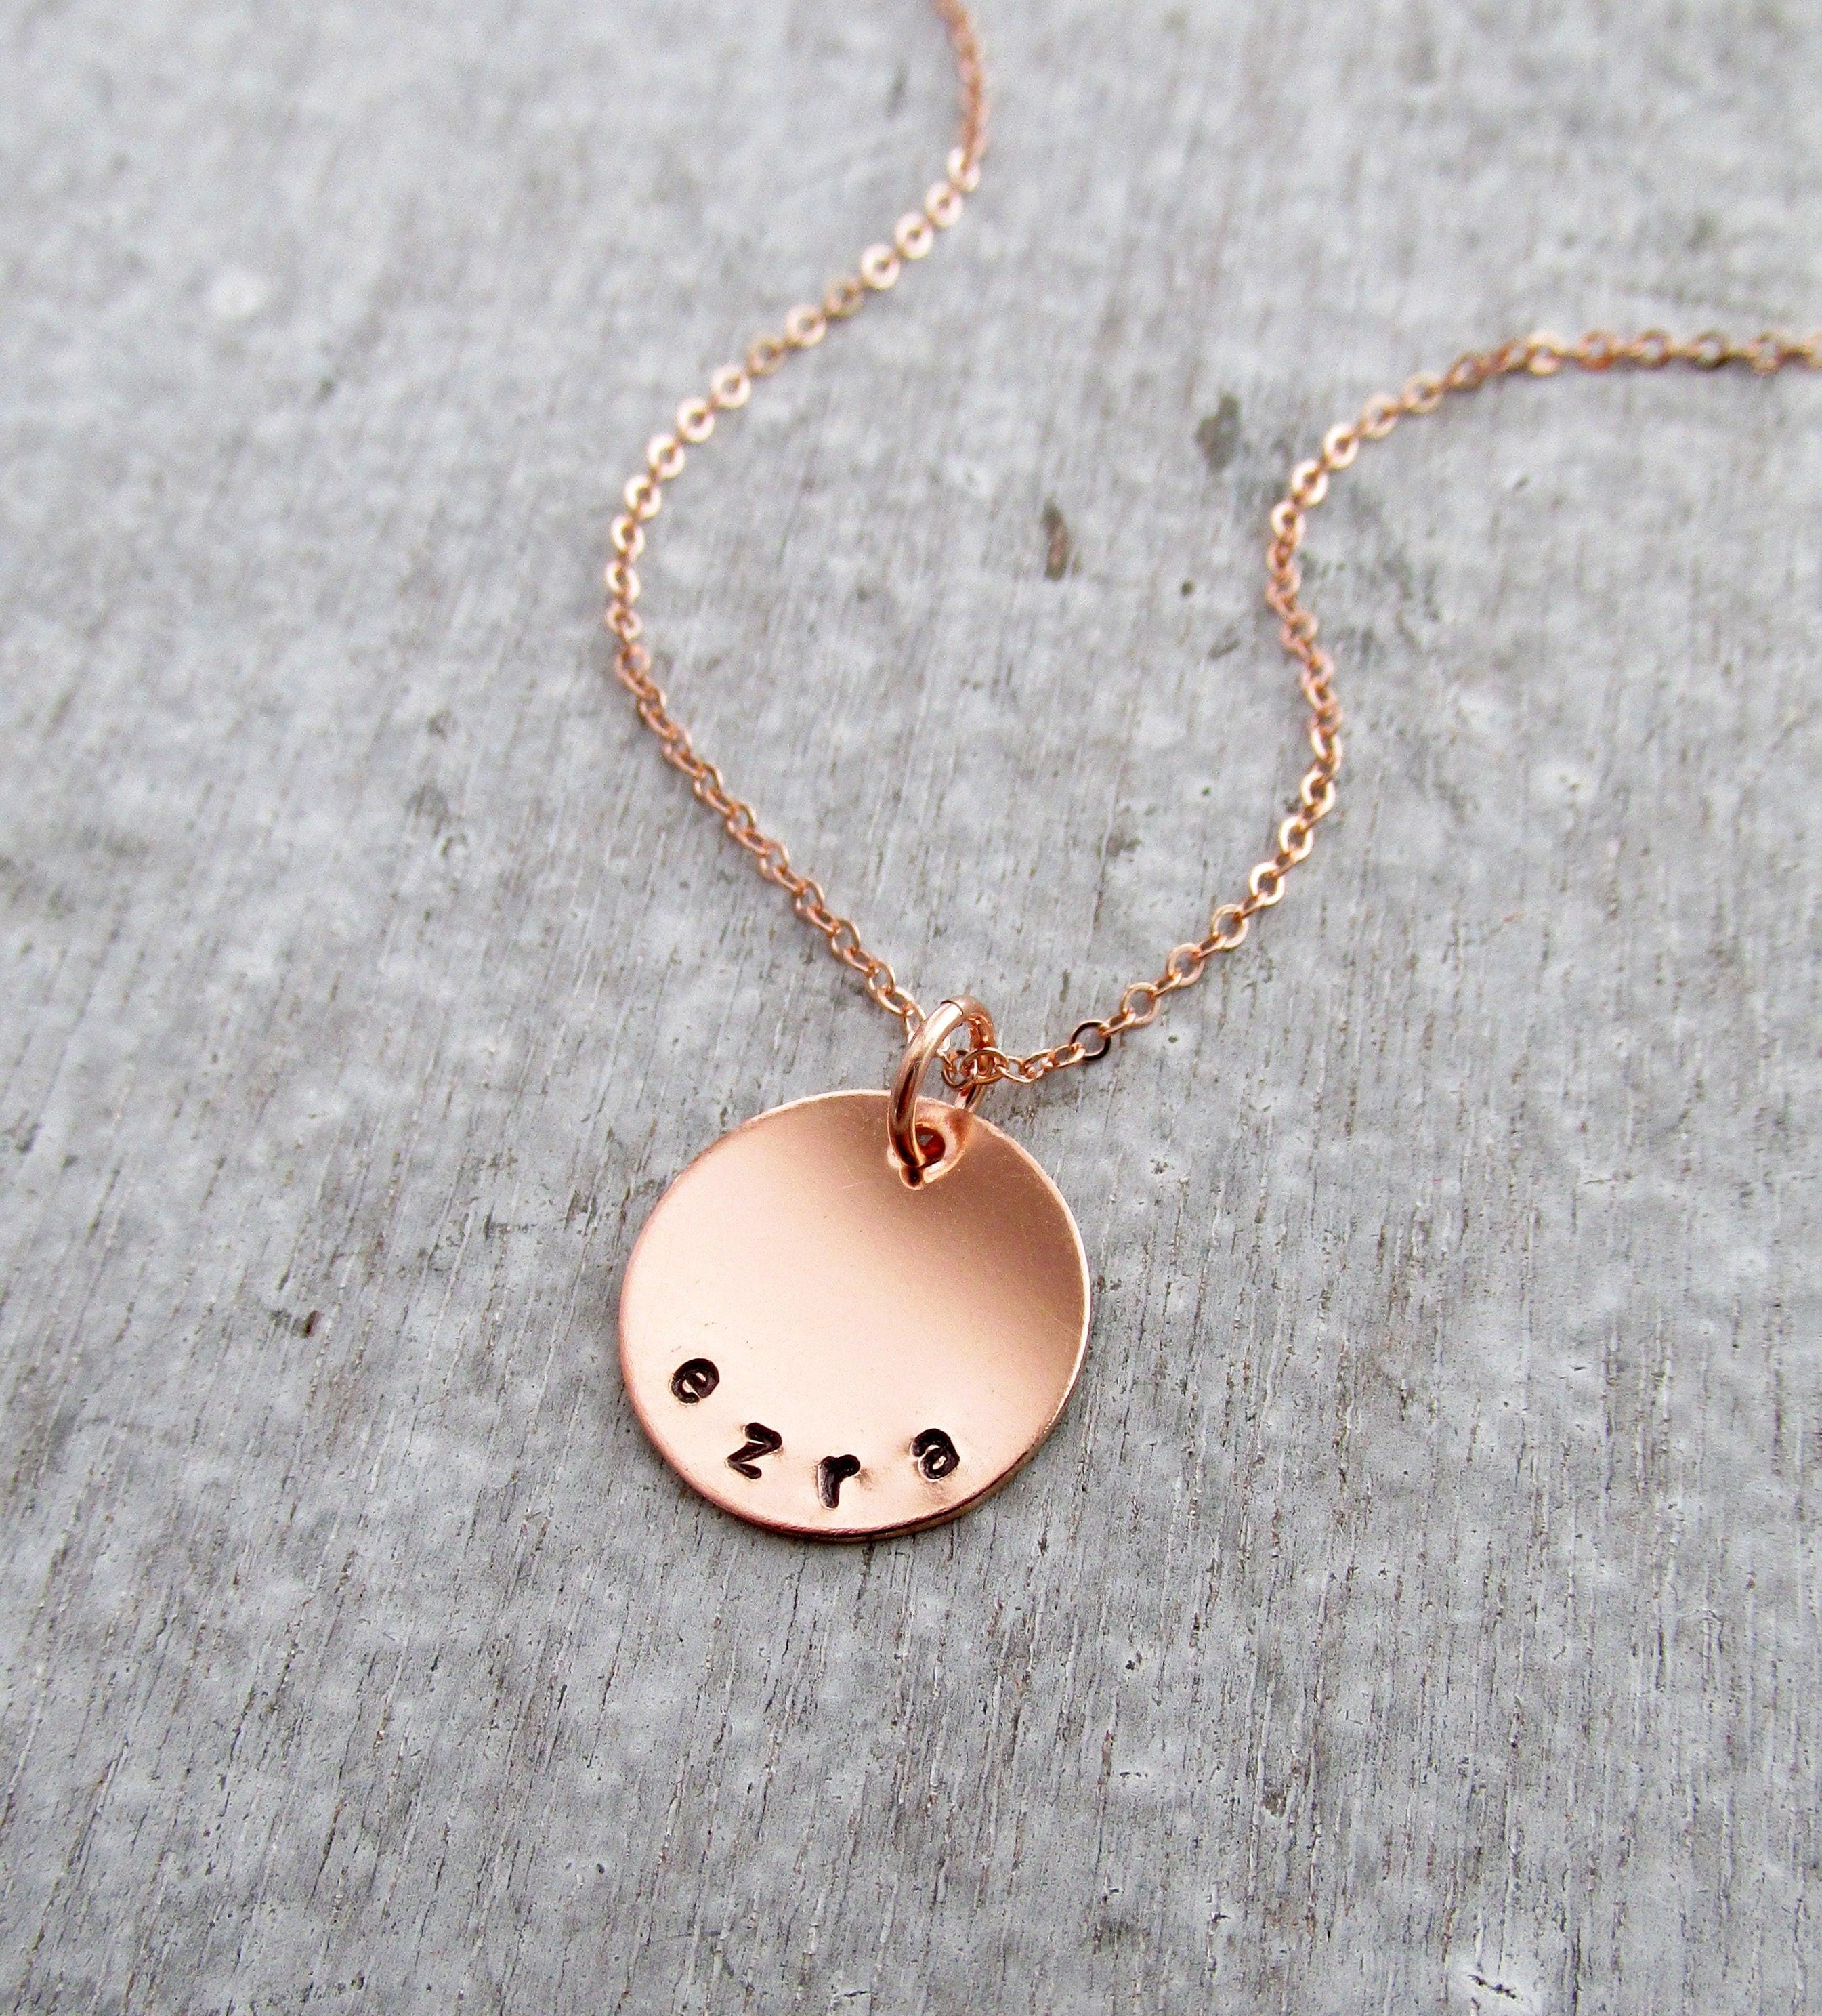 rose gold name necklace personalized mom necklace childrens. Black Bedroom Furniture Sets. Home Design Ideas